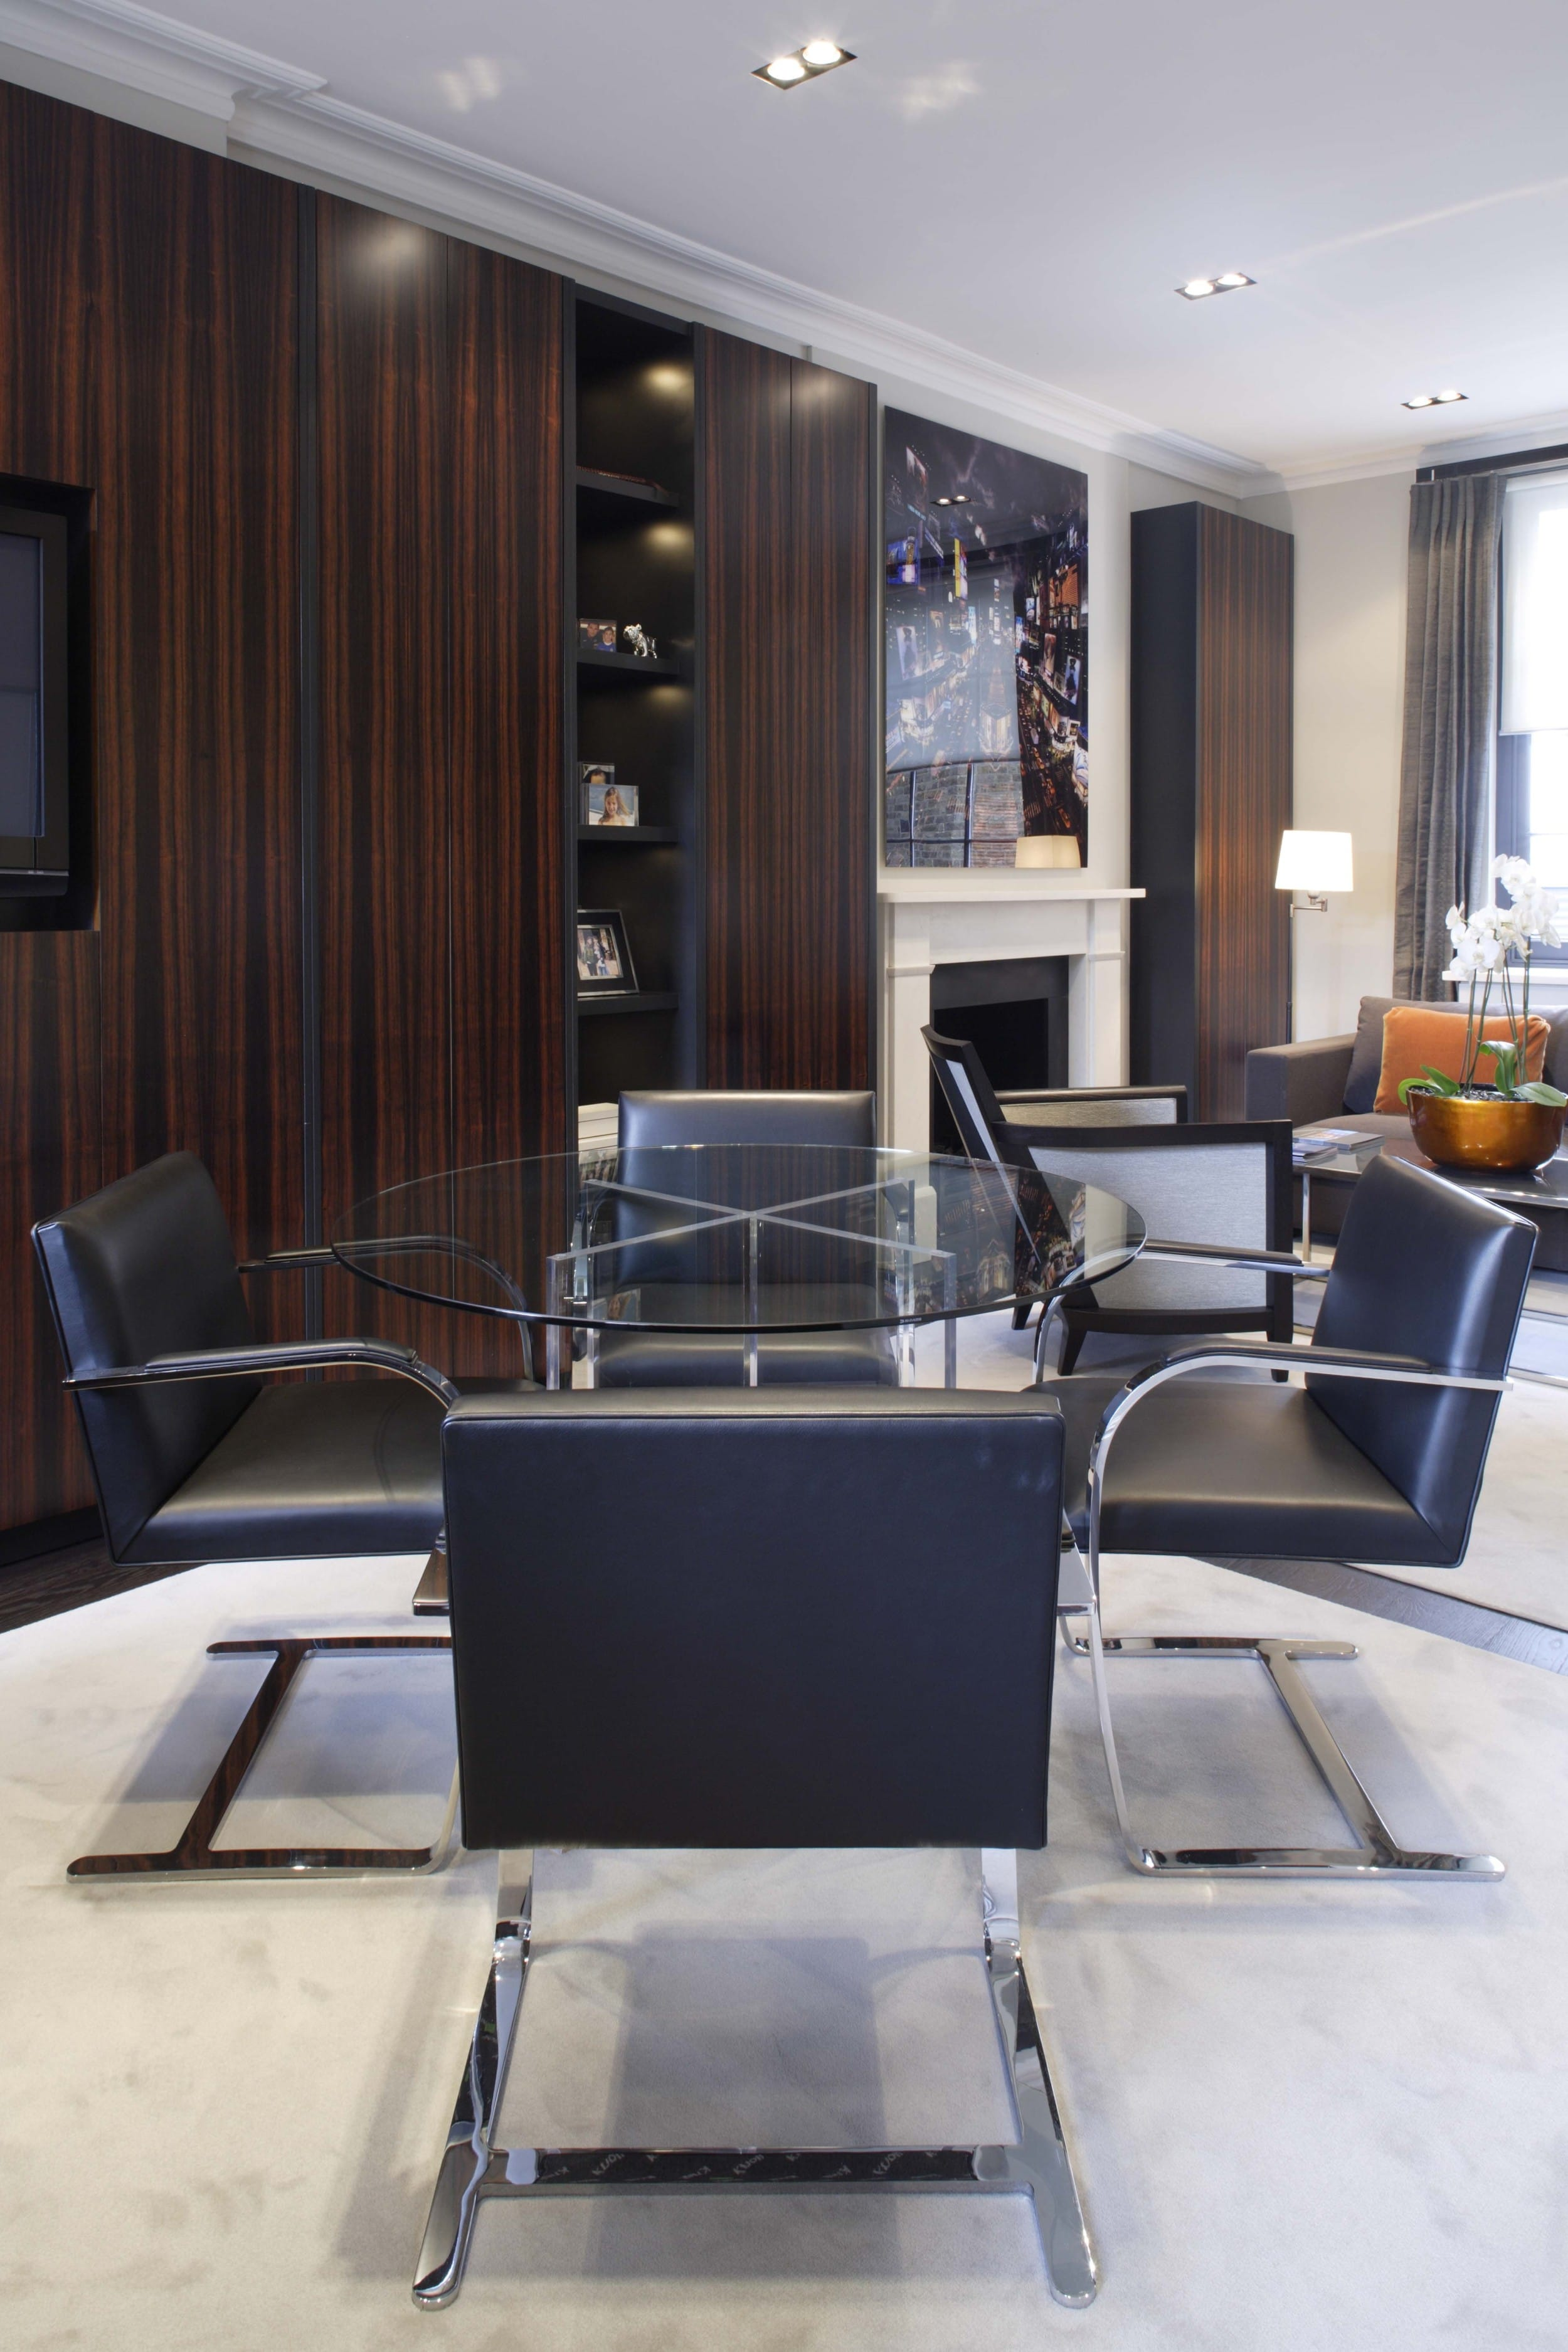 dining room interior design surrey